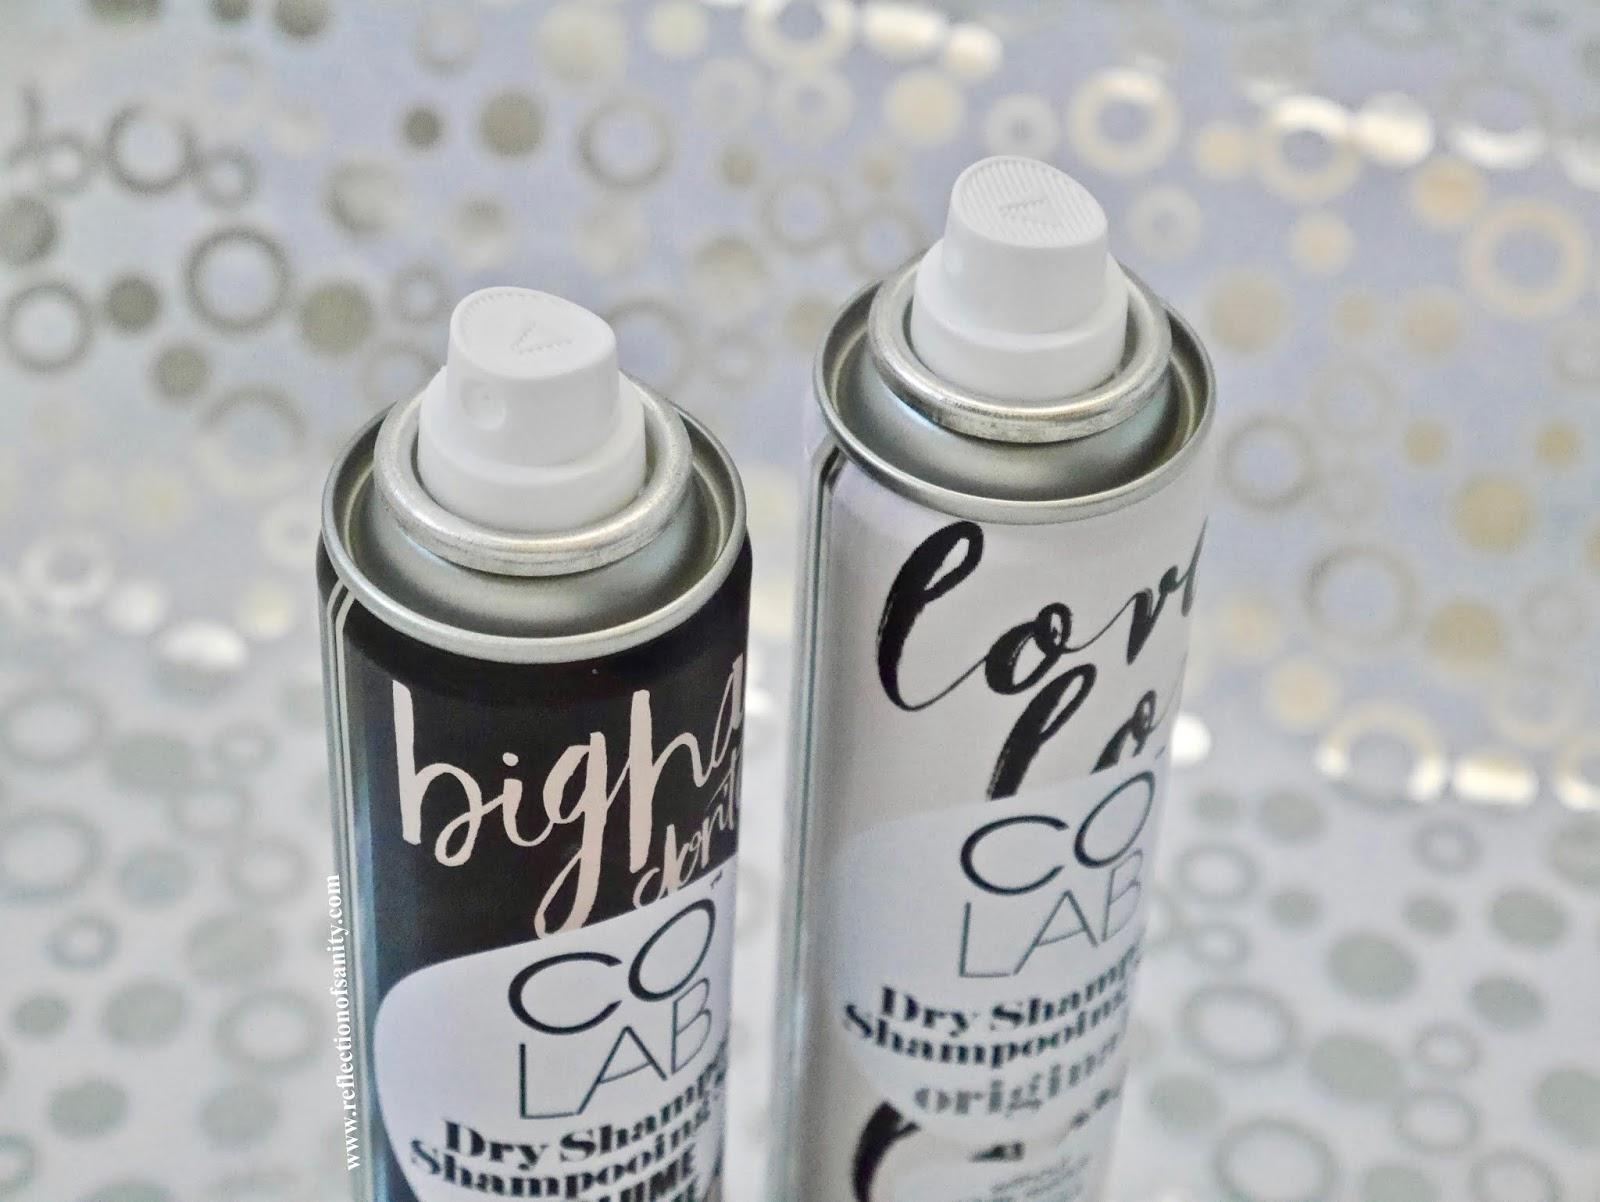 haircare, beauty, dry shampoo, Canadian beauty